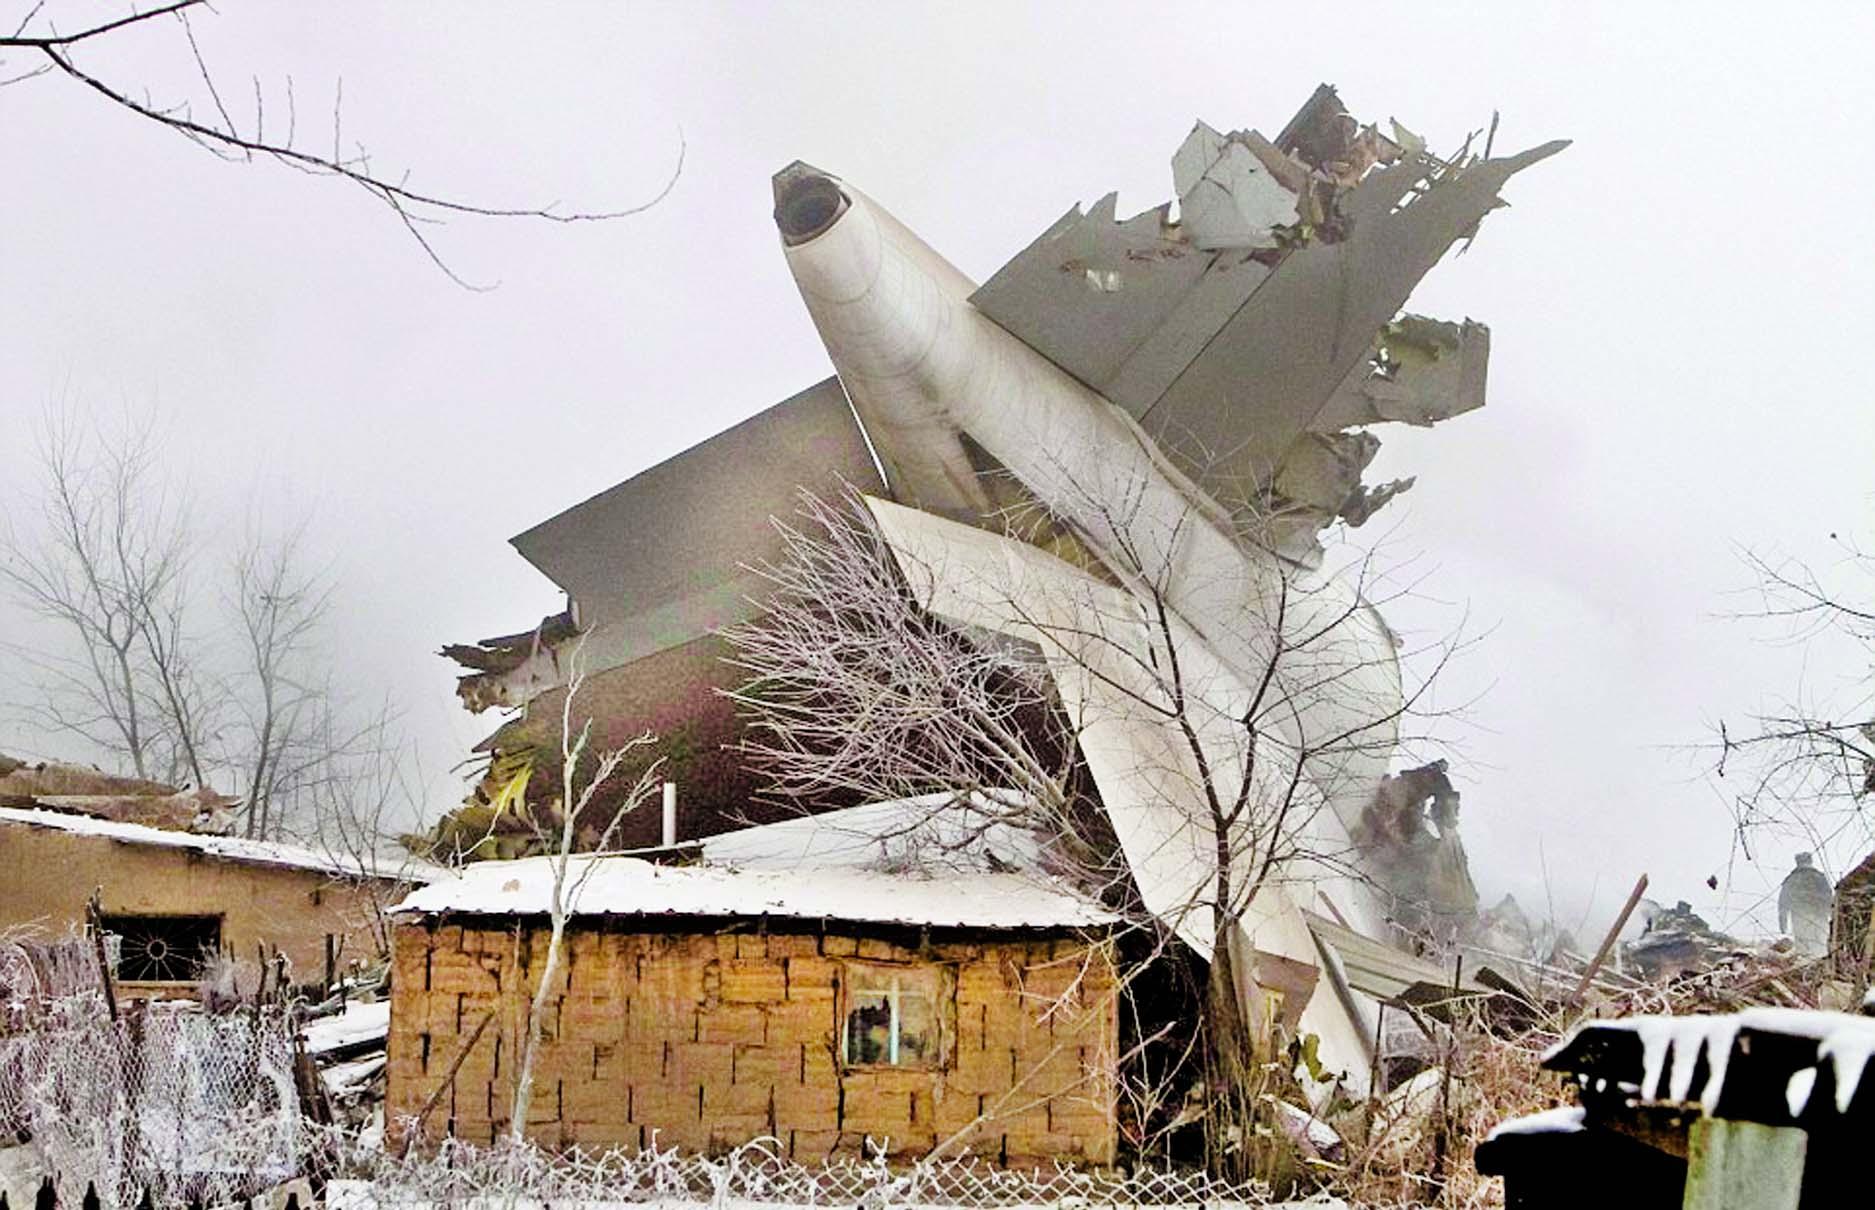 37 killed as Turkish plane crashes on Kyrgyzstan houses